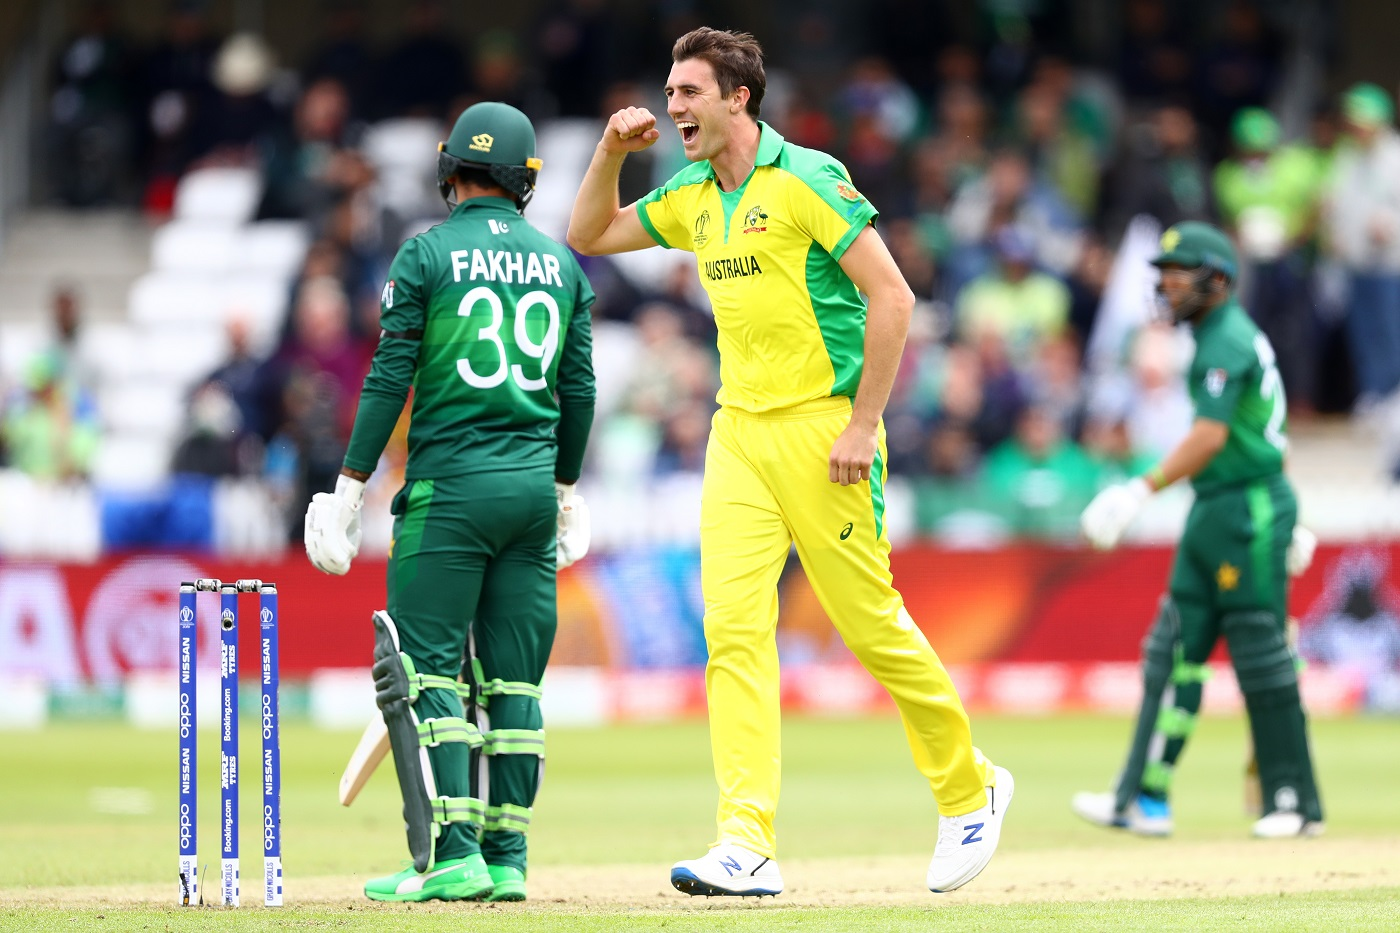 ICC World Cup 2019: Match 32, England vs Australia - Australia's Predicted Playing XI